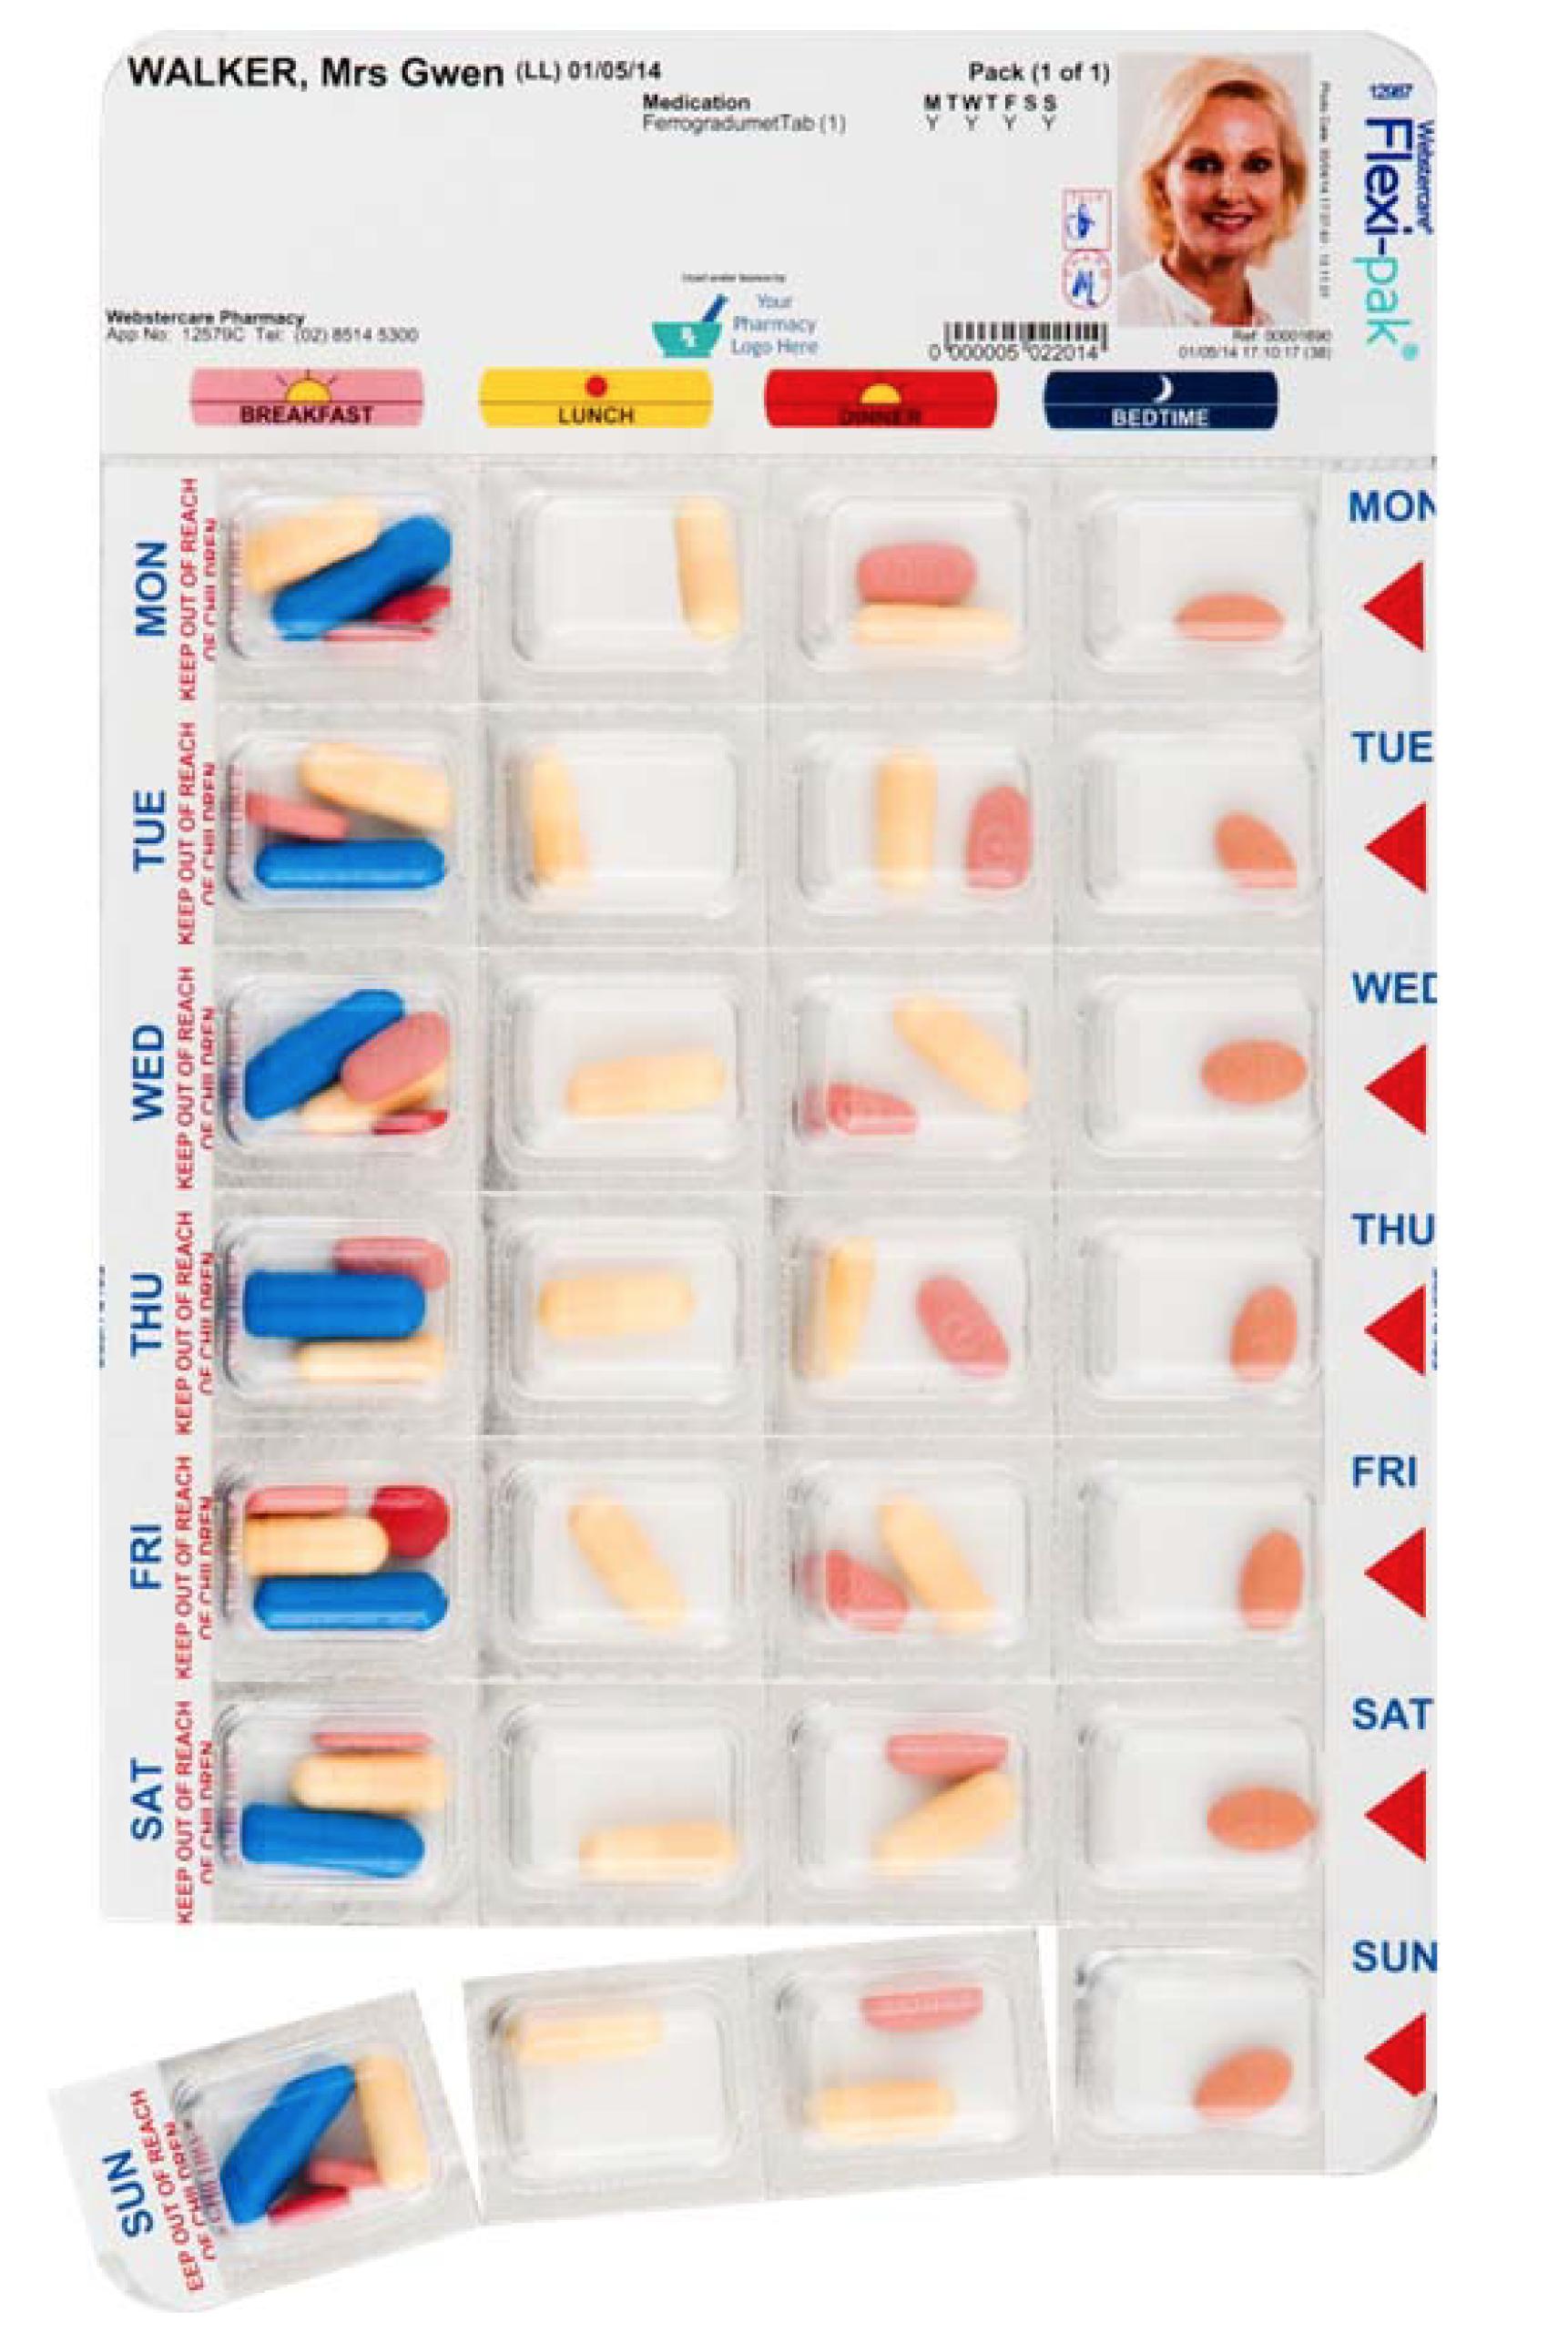 Perforated Blister Pack Multi-Pharma